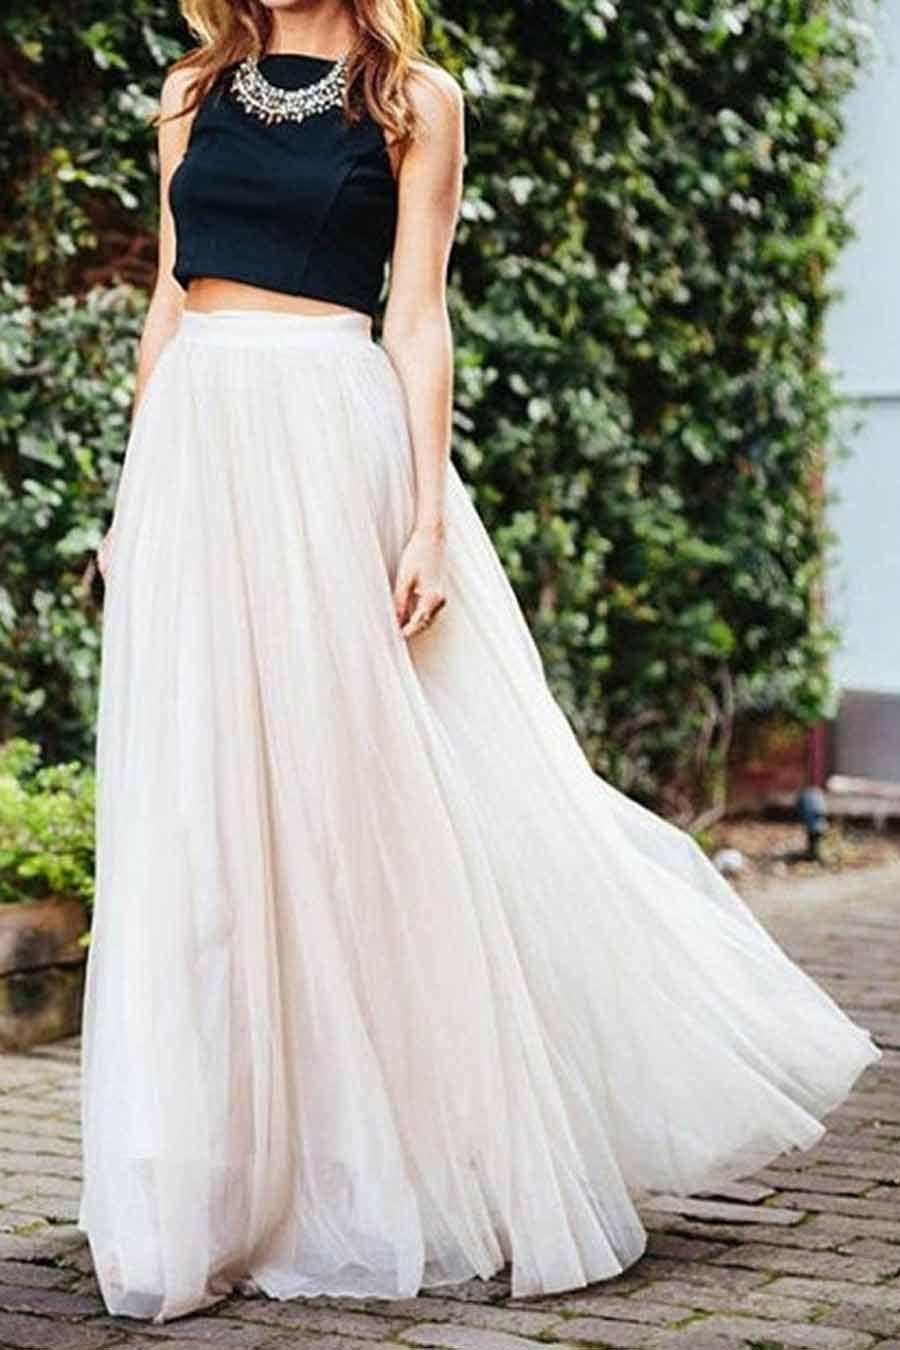 White High Waist Mesh Maxi Bubble Skirt